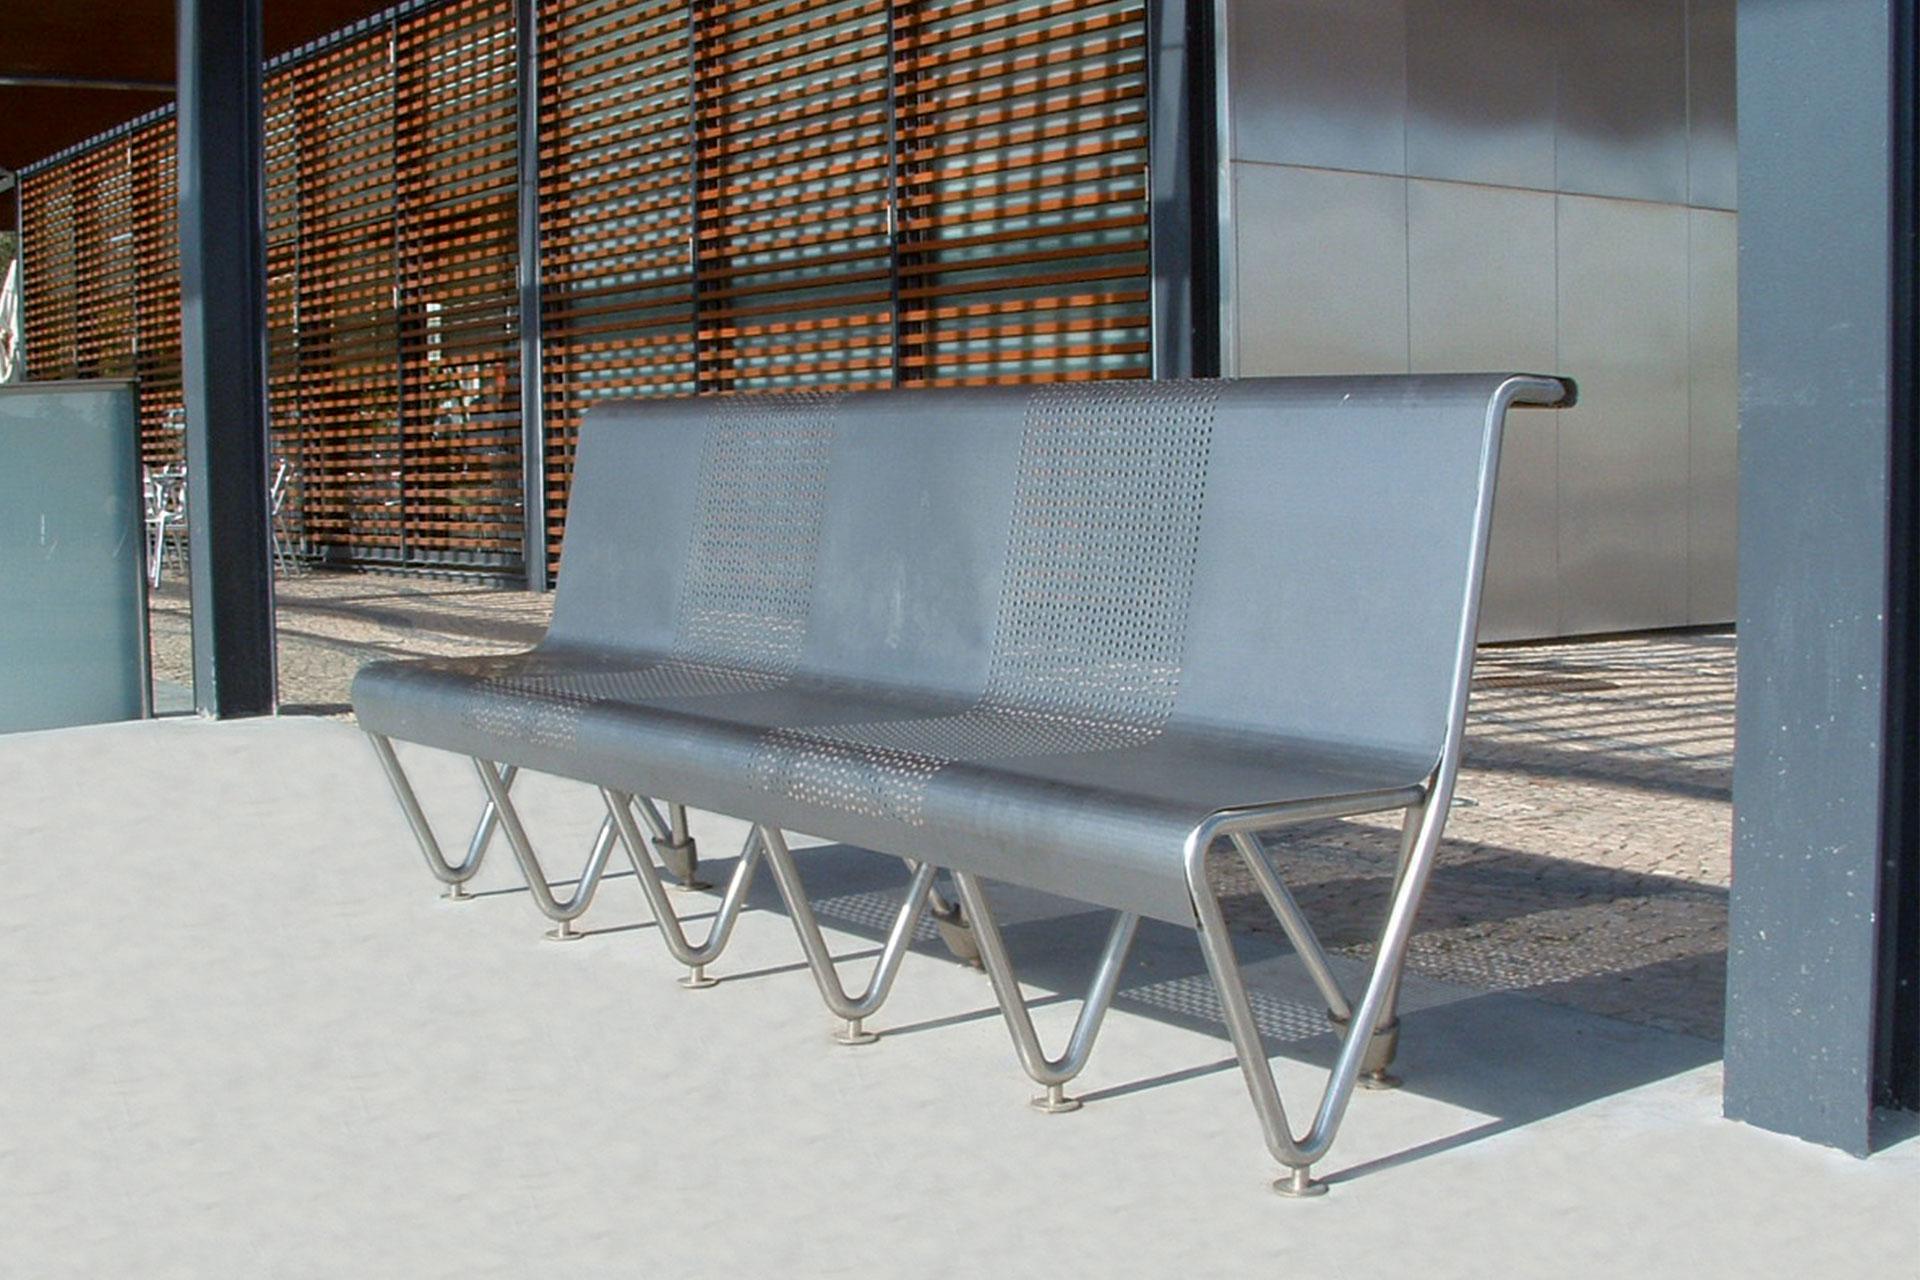 UrbanObjekts Mateo Sitzgelegenheiten